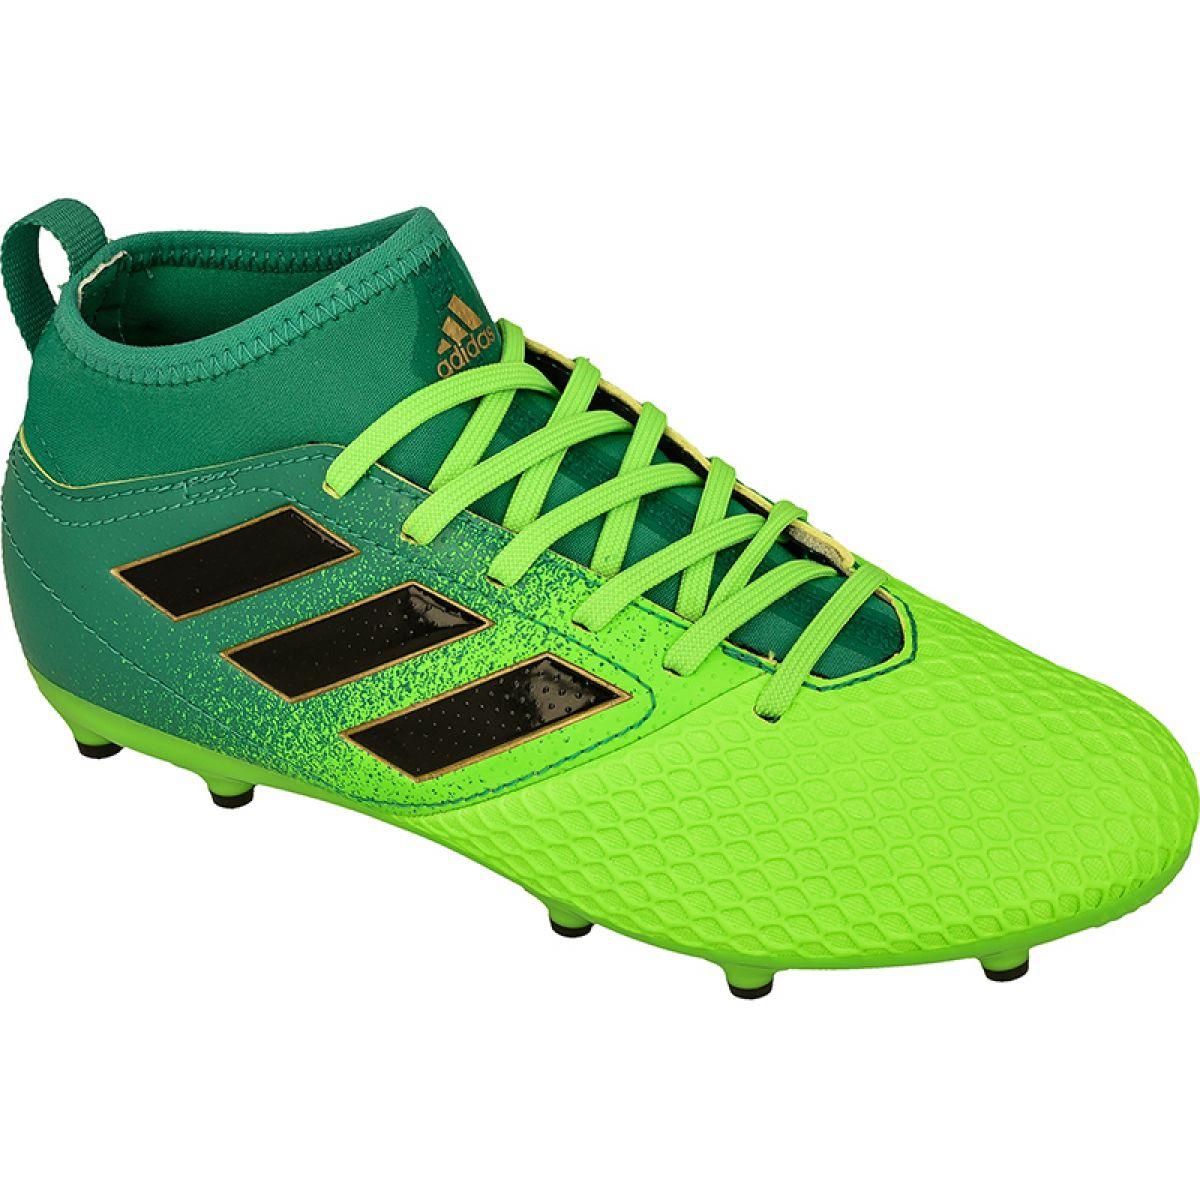 Adidas Ace 17.3 Fg Jr BB1027 Fußballschuhe